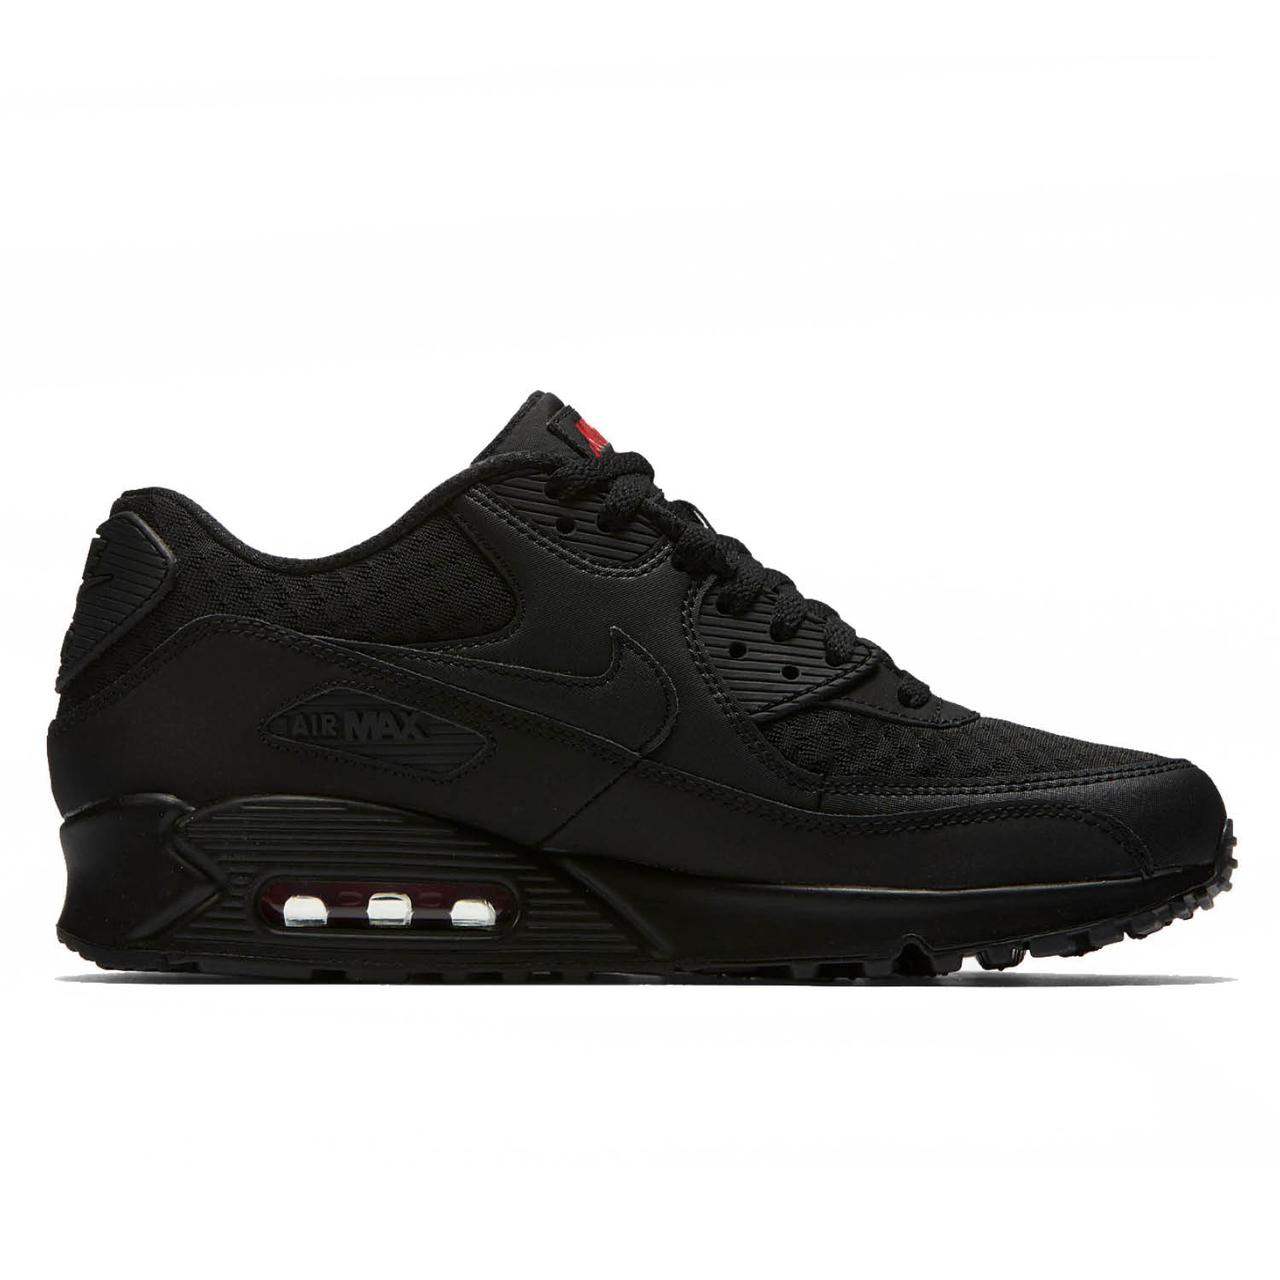 5ddbc958 Оригинальные Кроссовки Nike Air Max 90 Essential Black / Red — в ...